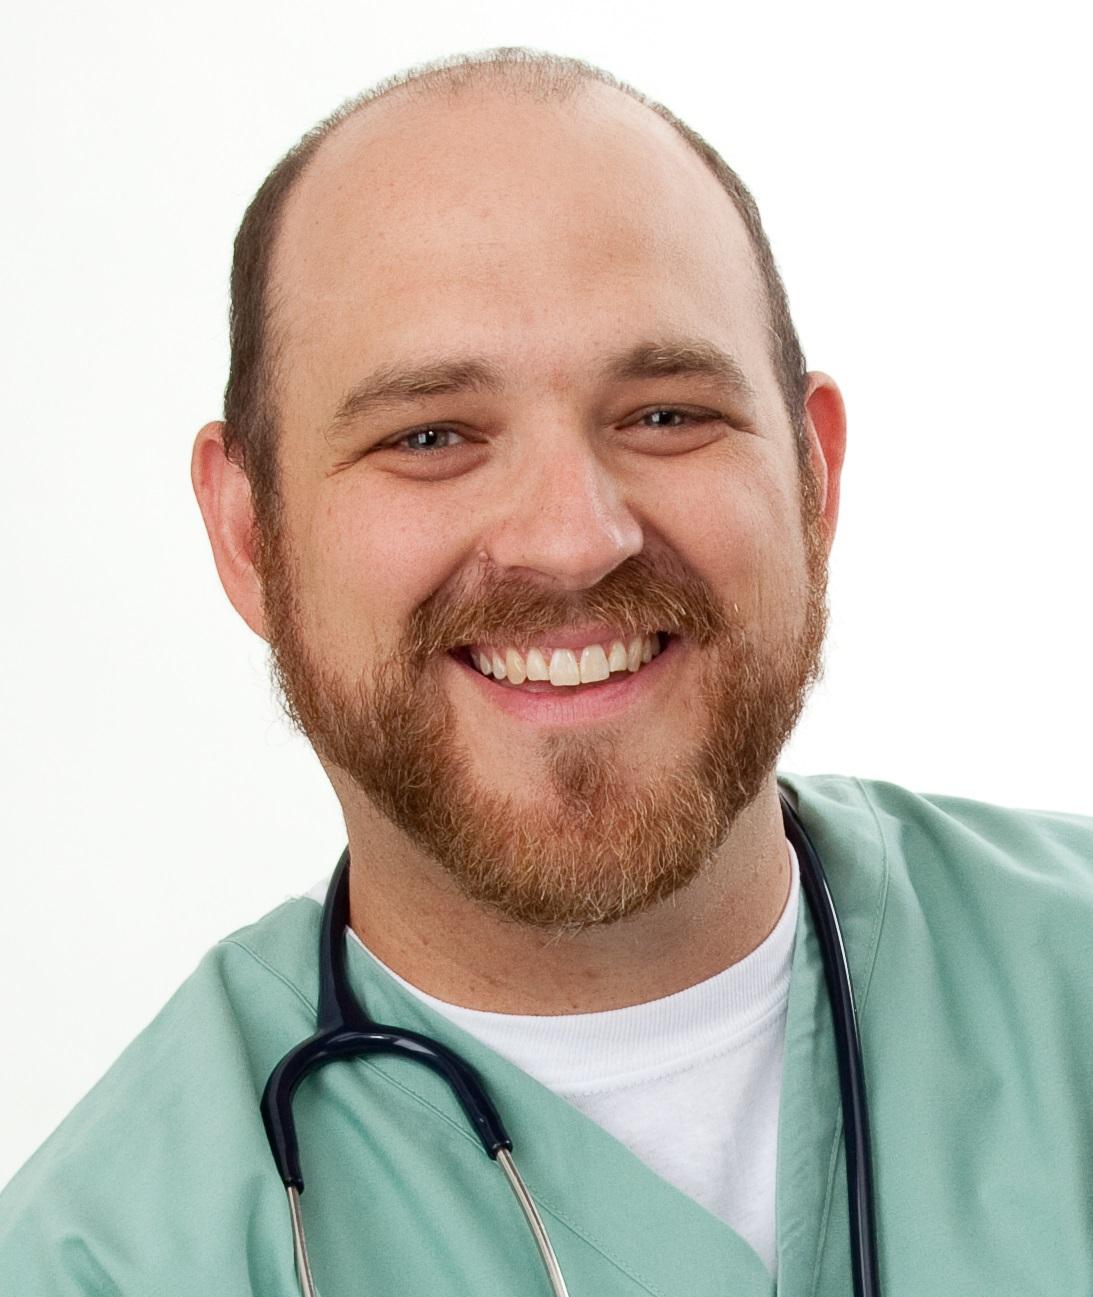 Dr. Vance Lassey of Holton, KS